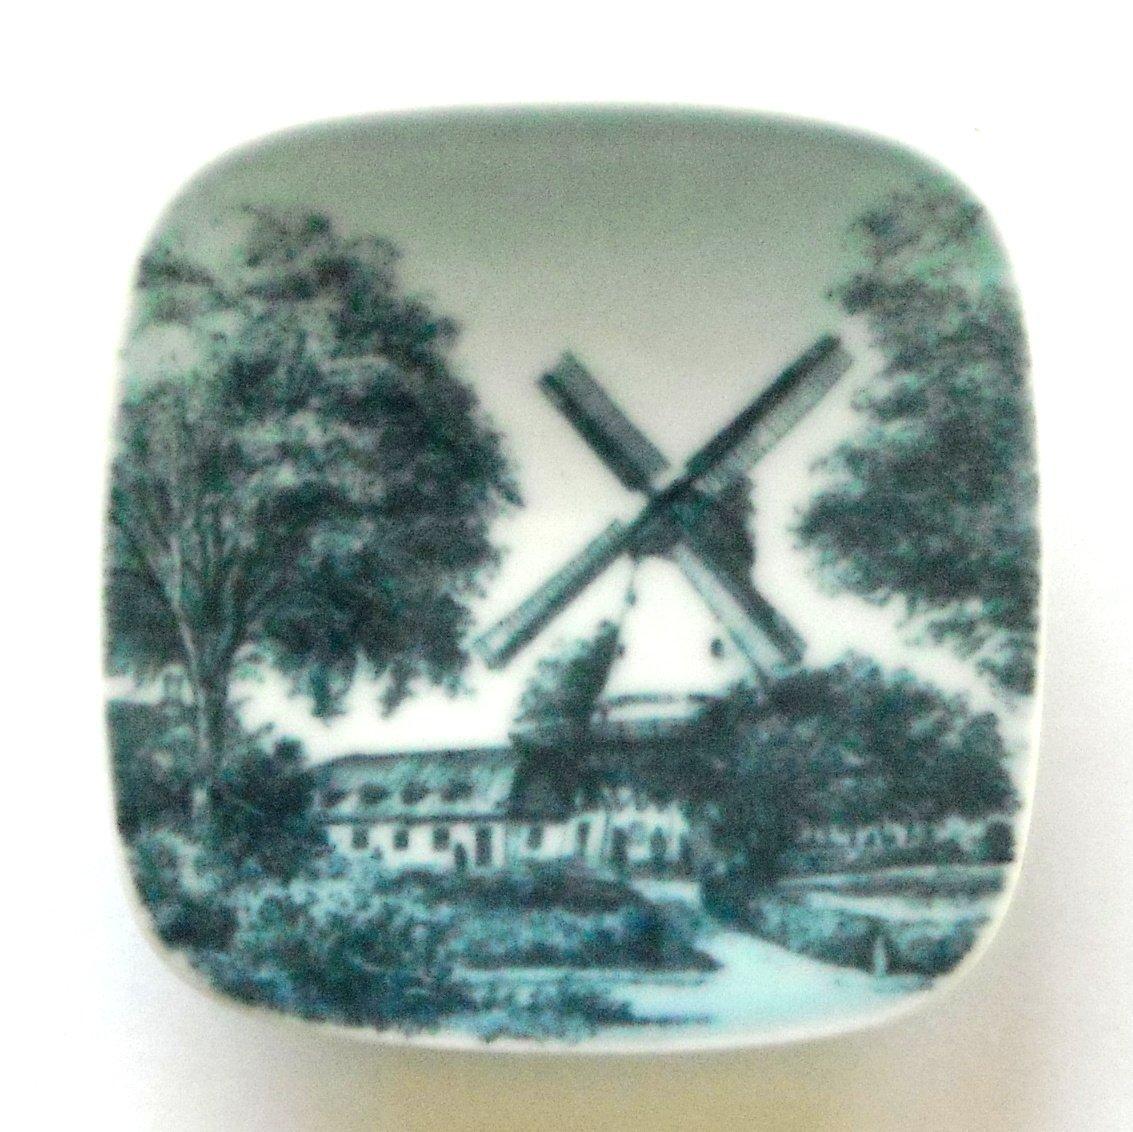 Dybbol Molle Bing Grondahl Copenhagen Denmark Small Plate Ornament